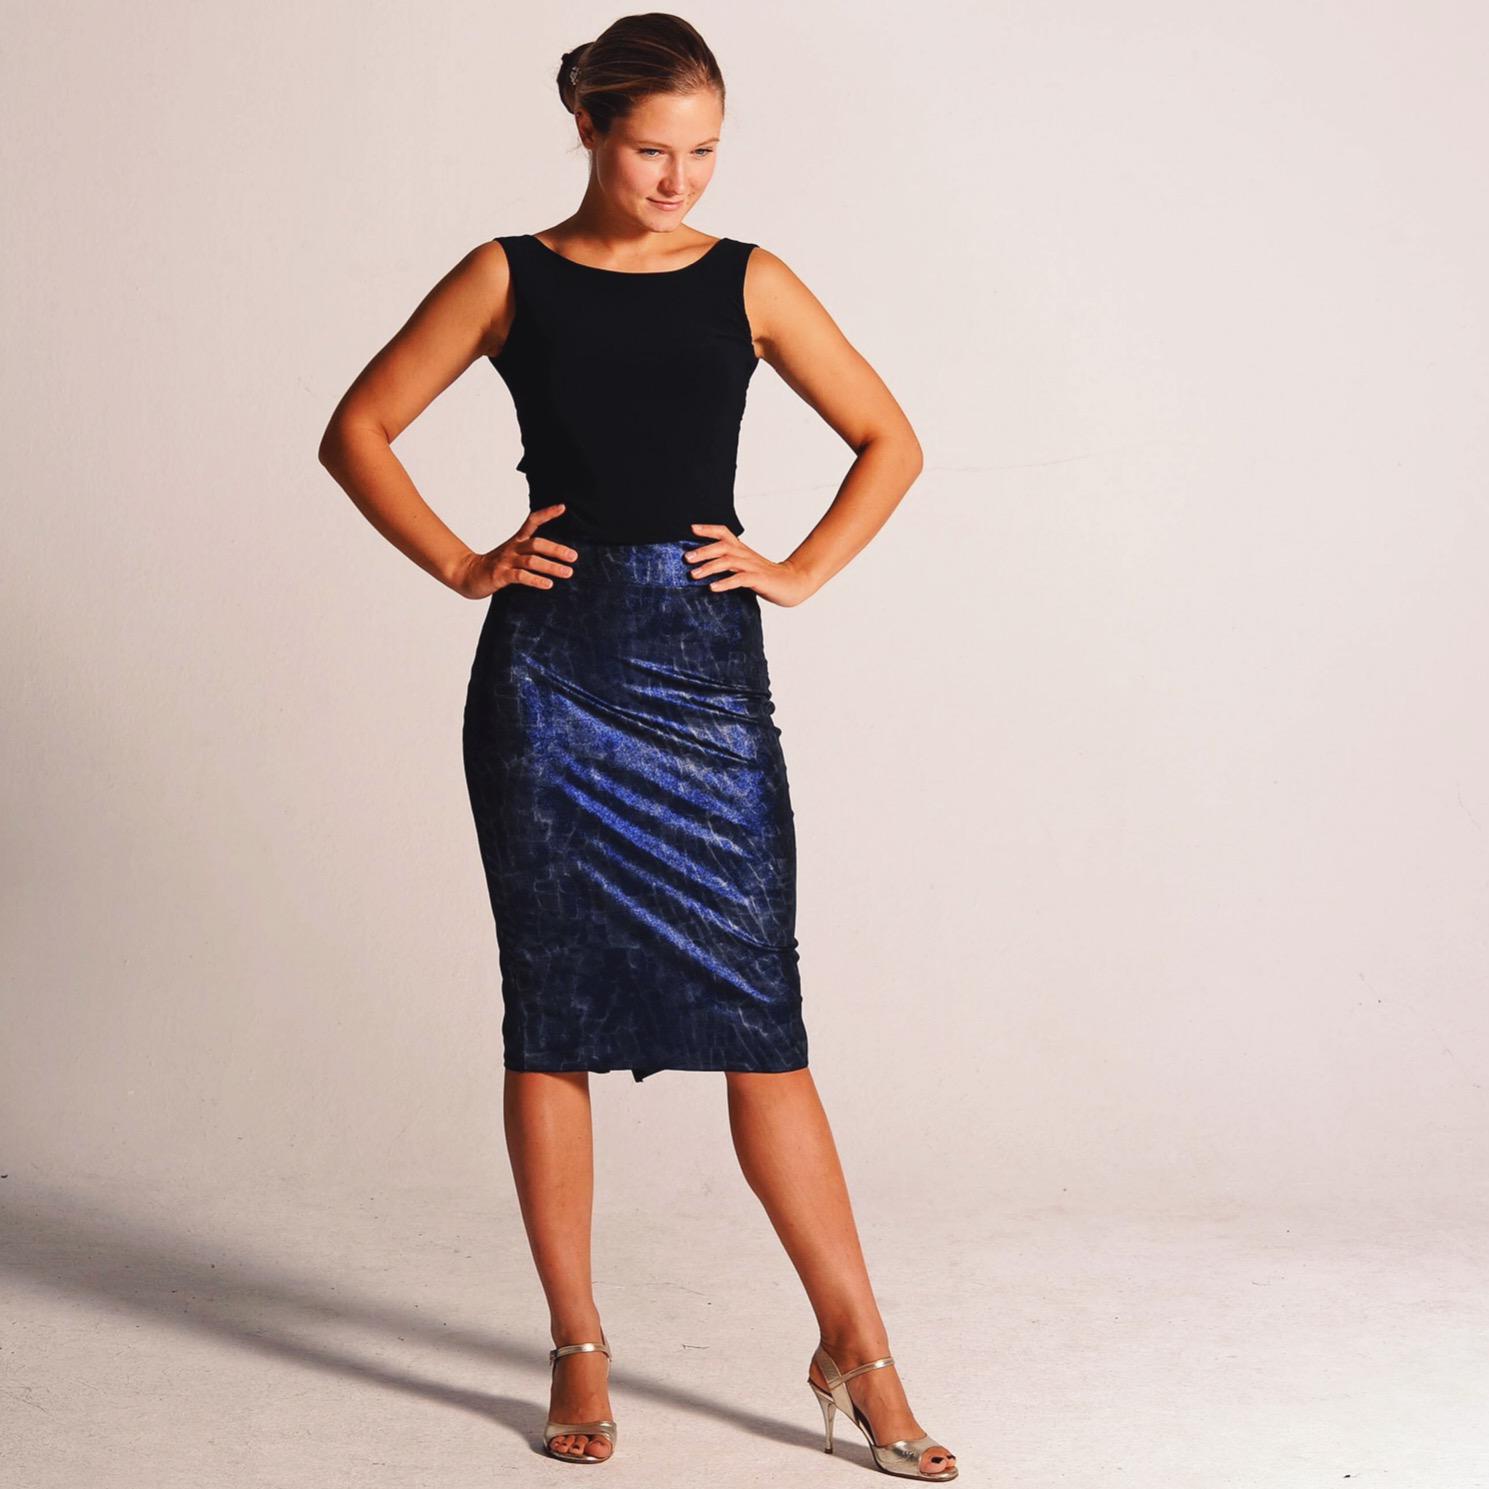 CLARA_metallic_blue_tango_outfit_coleccionberlin.JPG